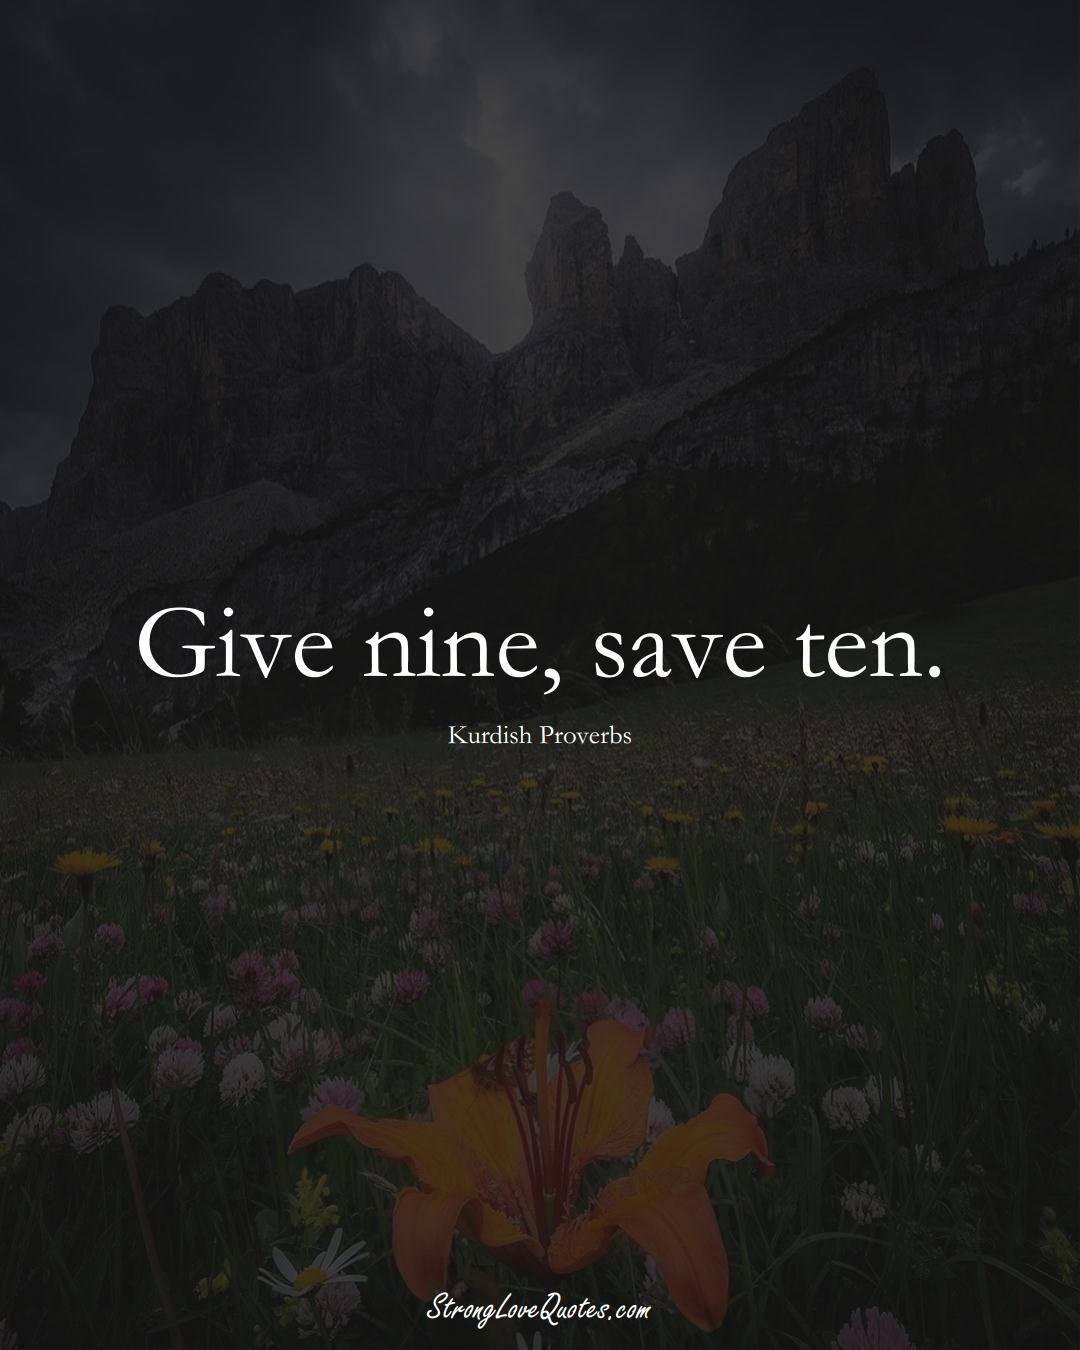 Give nine, save ten. (Kurdish Sayings);  #aVarietyofCulturesSayings